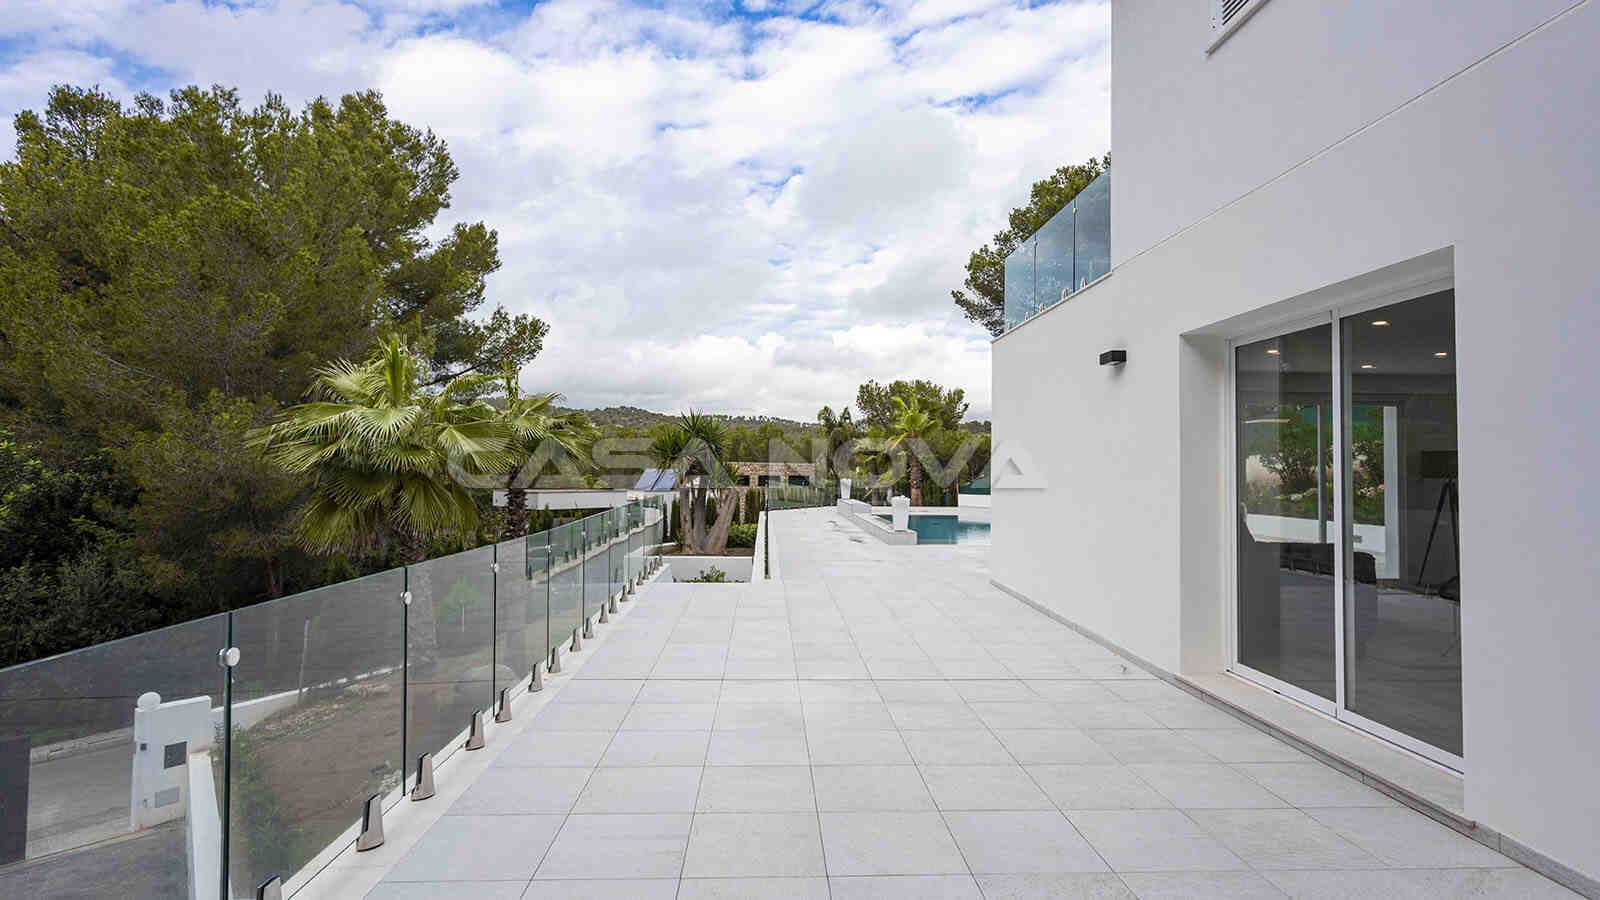 Mallorca Immobilien mit viel Privatsphäre